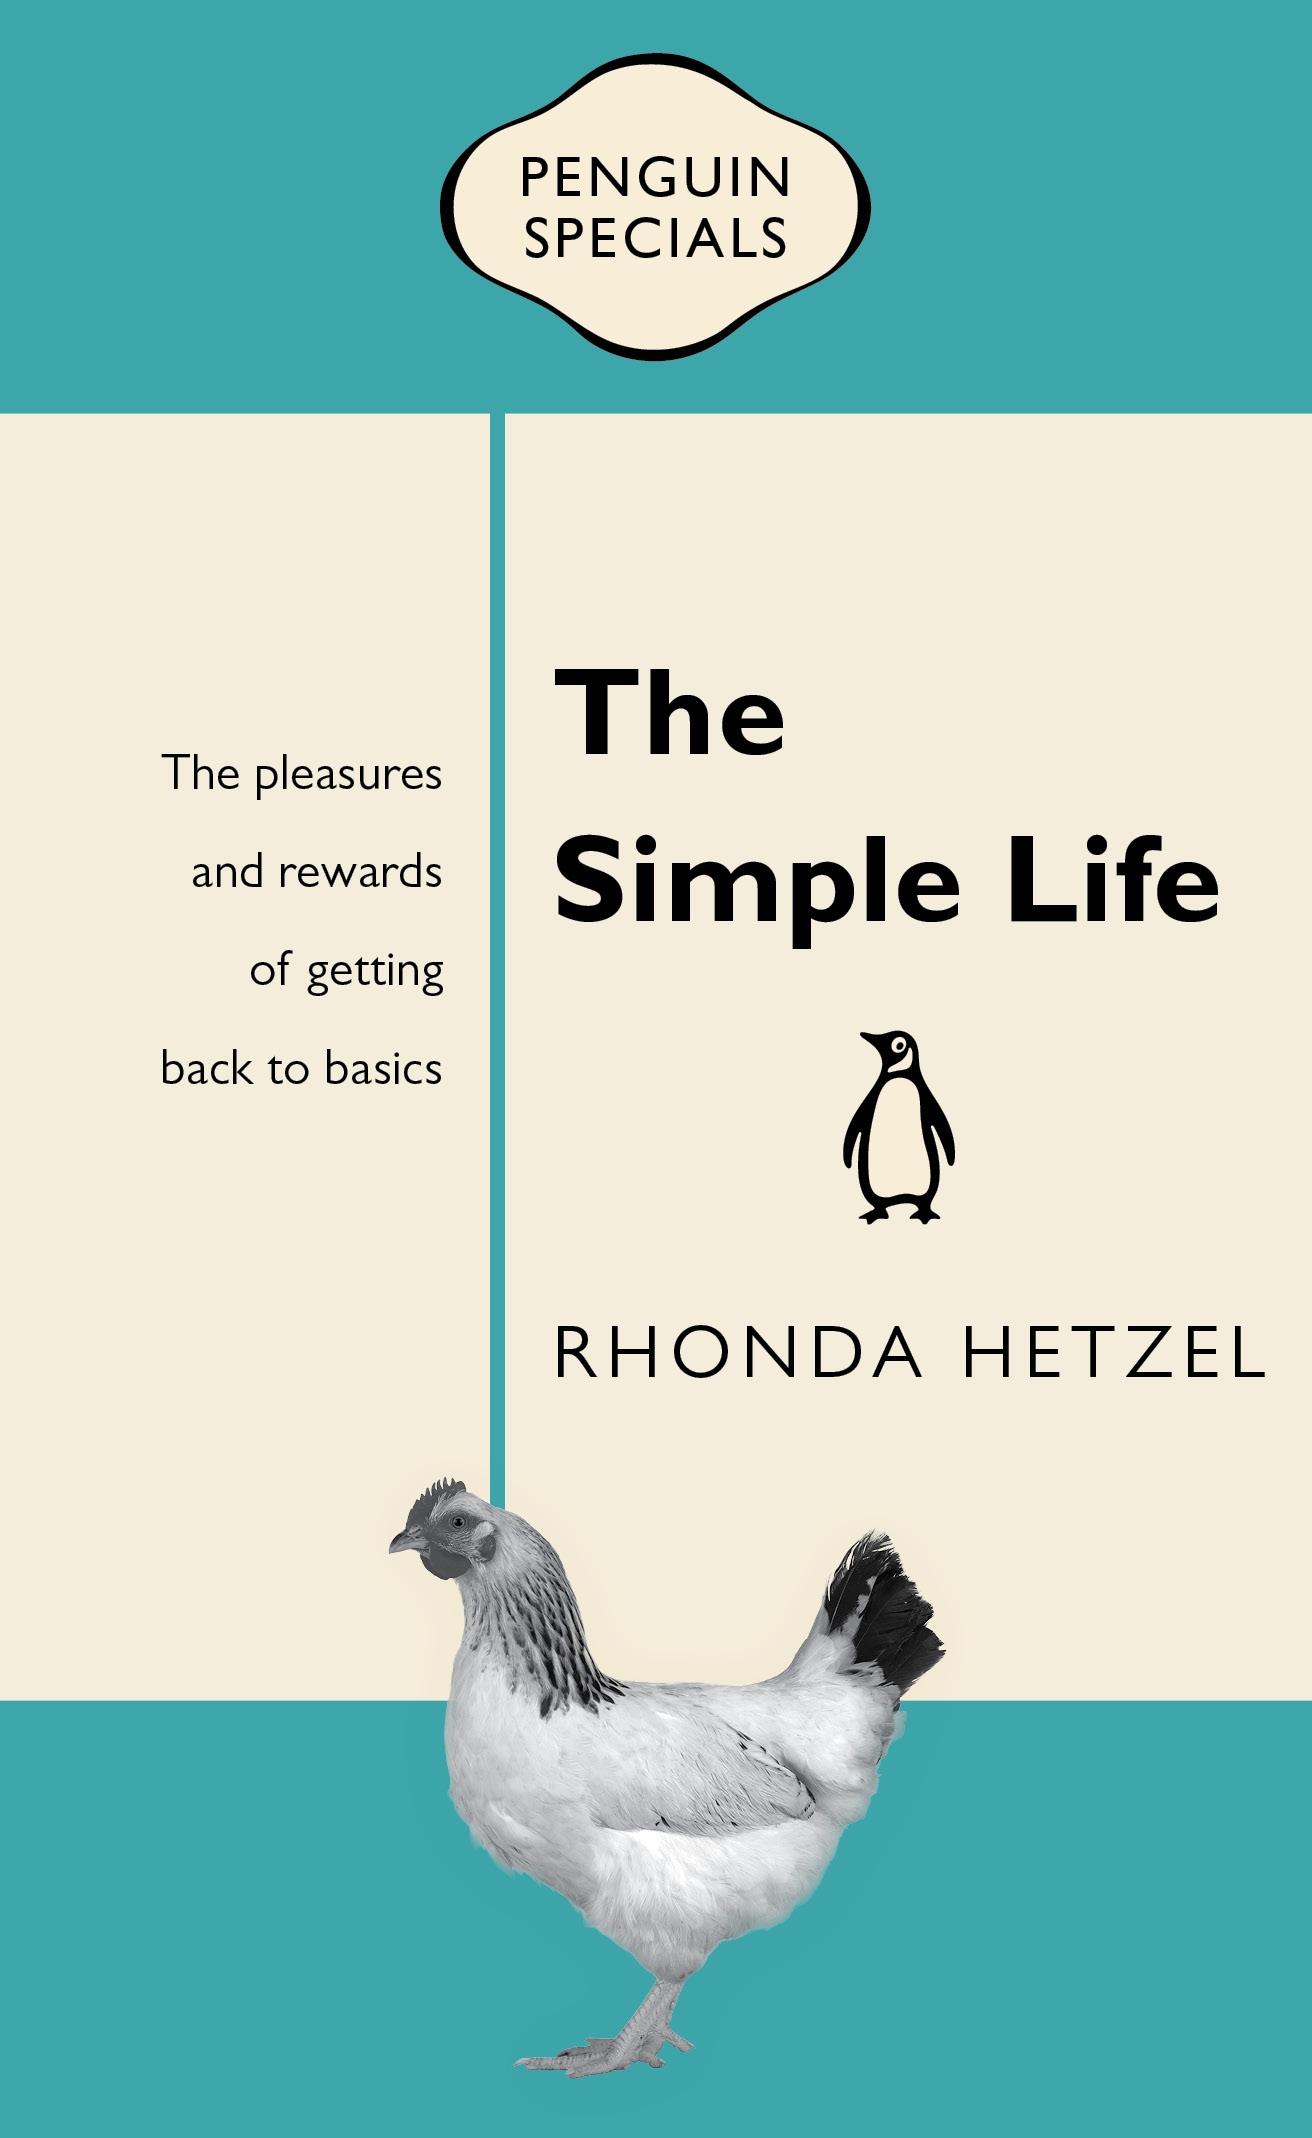 The Simple Life: Penguin Specials by Rhonda Hetzel - Penguin Books